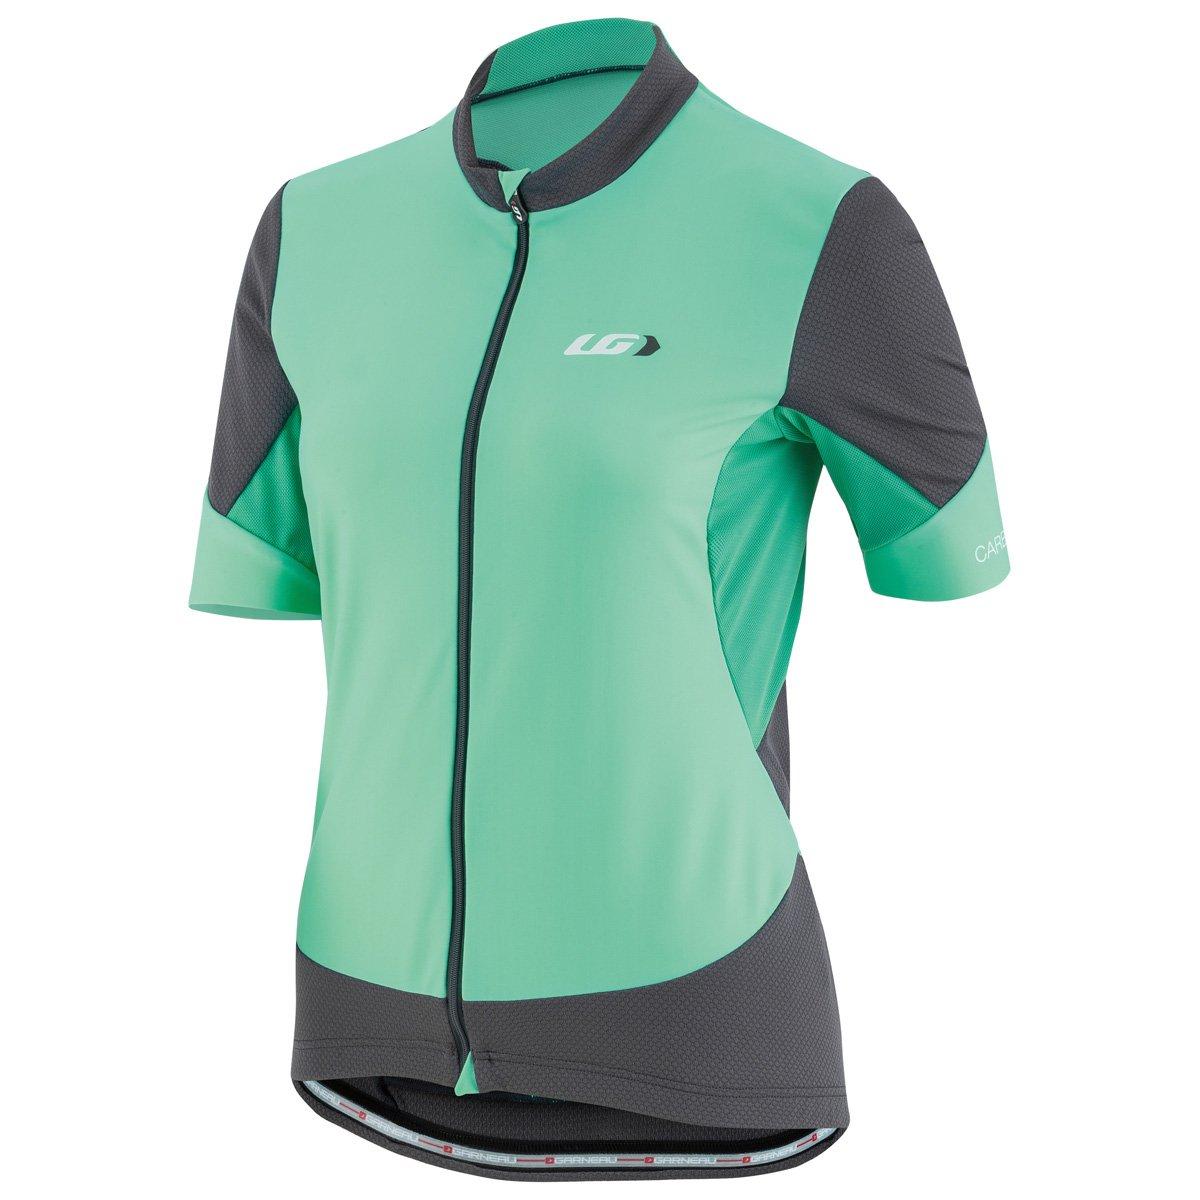 12aff7ac5 Amazon.com   Louis Garneau Carbon Mesh Jersey - Women s   Sports ...